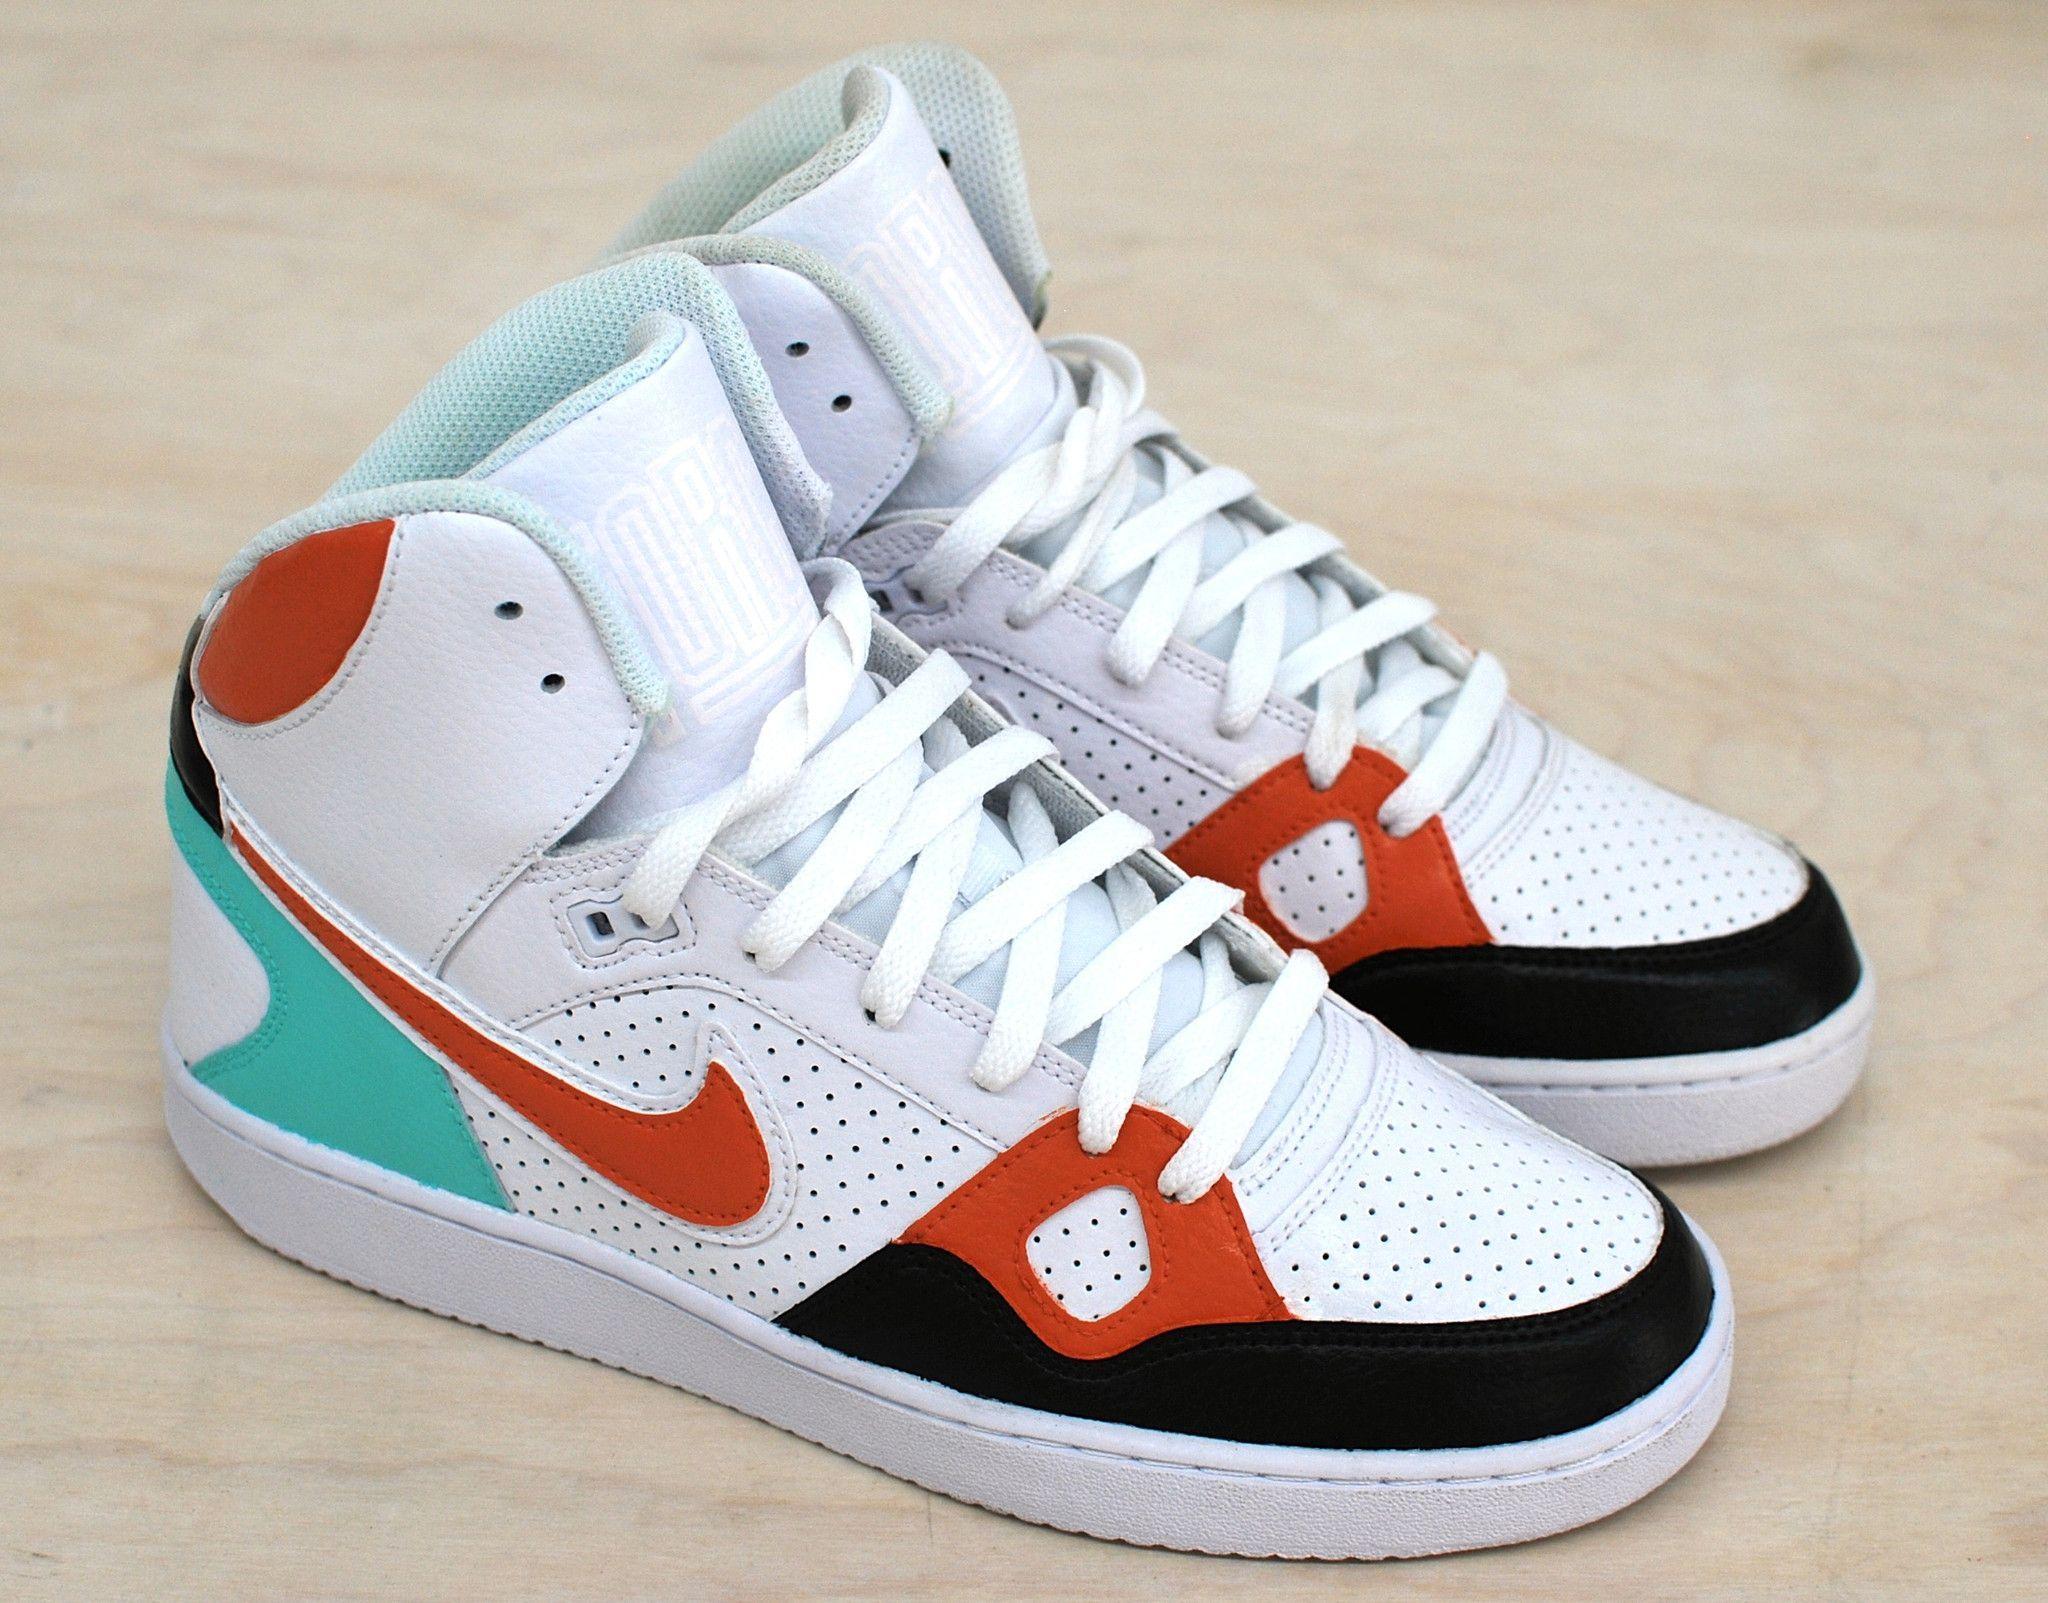 Son of Force - Custom Hand Painted Nike Sneakers